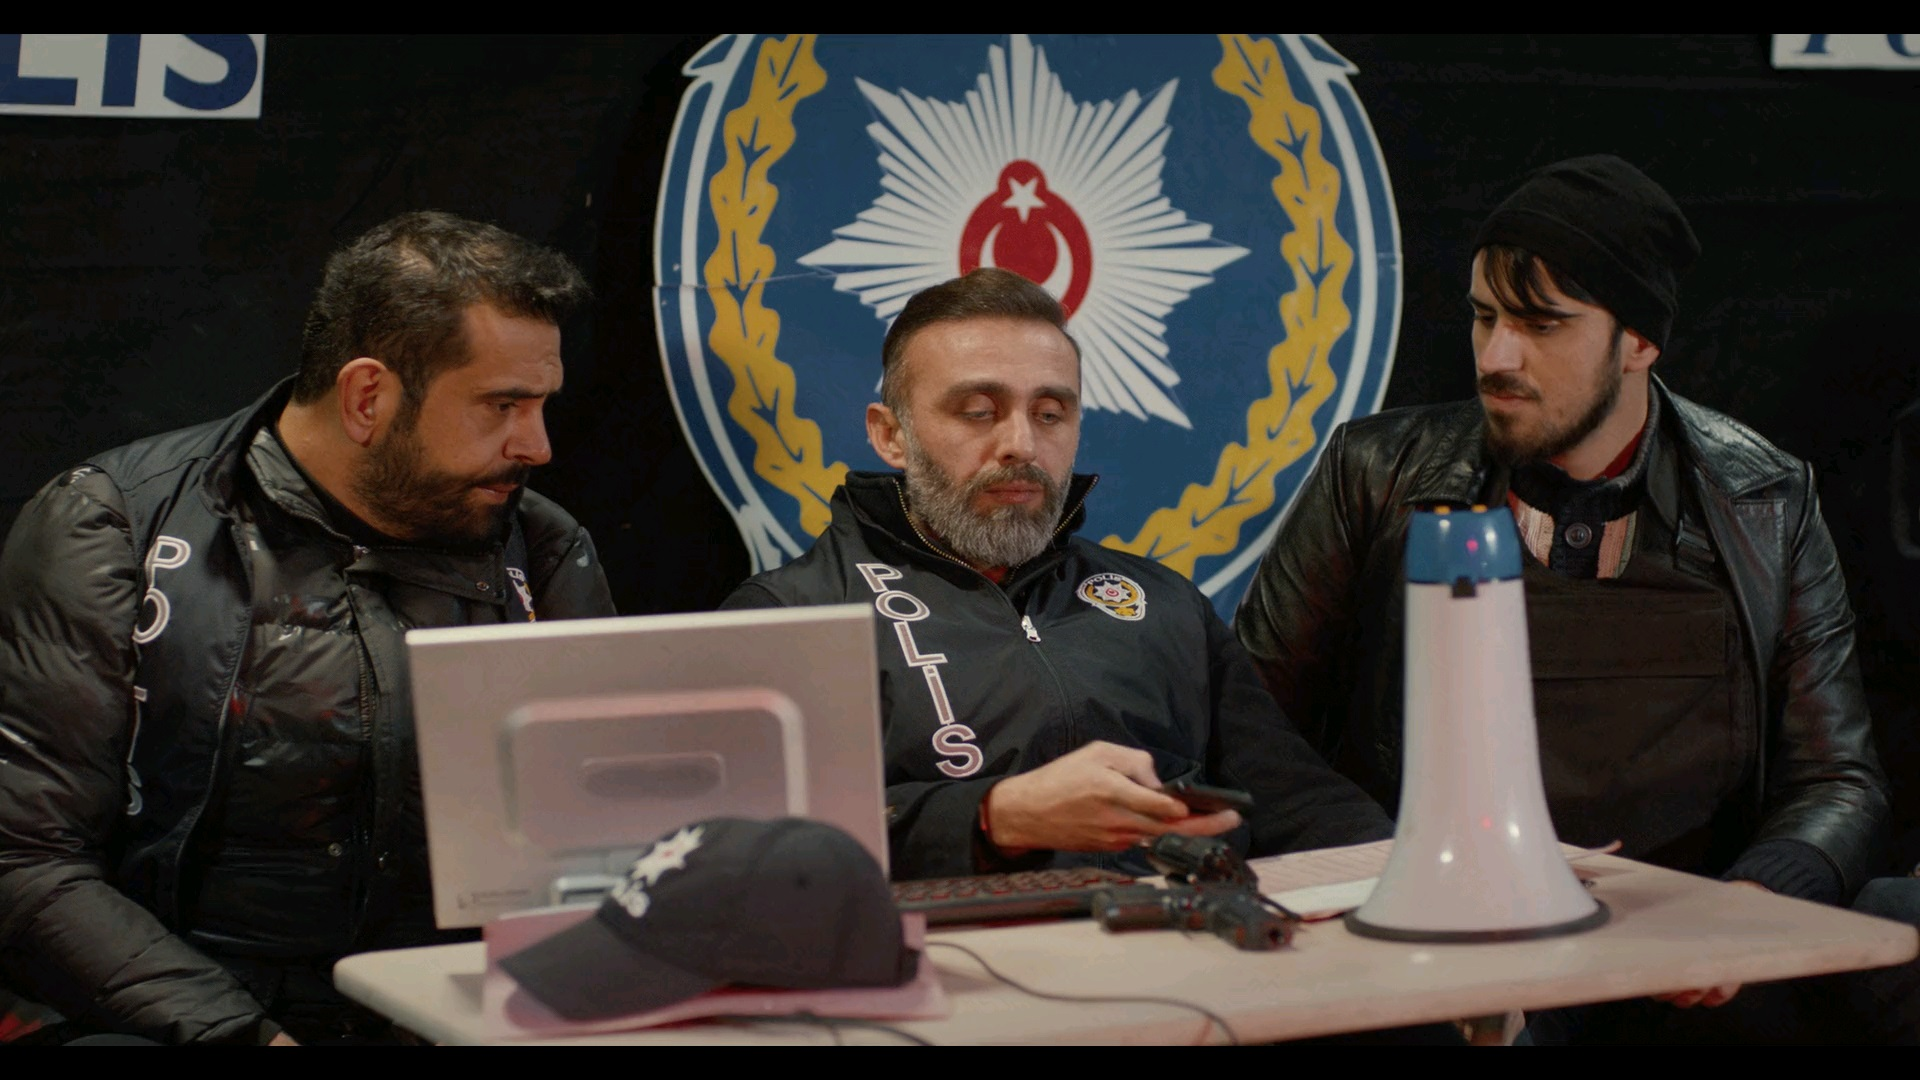 Mazlum Kuzey & Kuddusi 2: La! Kasada Para Var! | 2019 | Yerli Film | NF | WEB-DL | XviD | Sansürsüz | 720p - 1080p - m720p - m1080p | WEB-DL | Tek Link